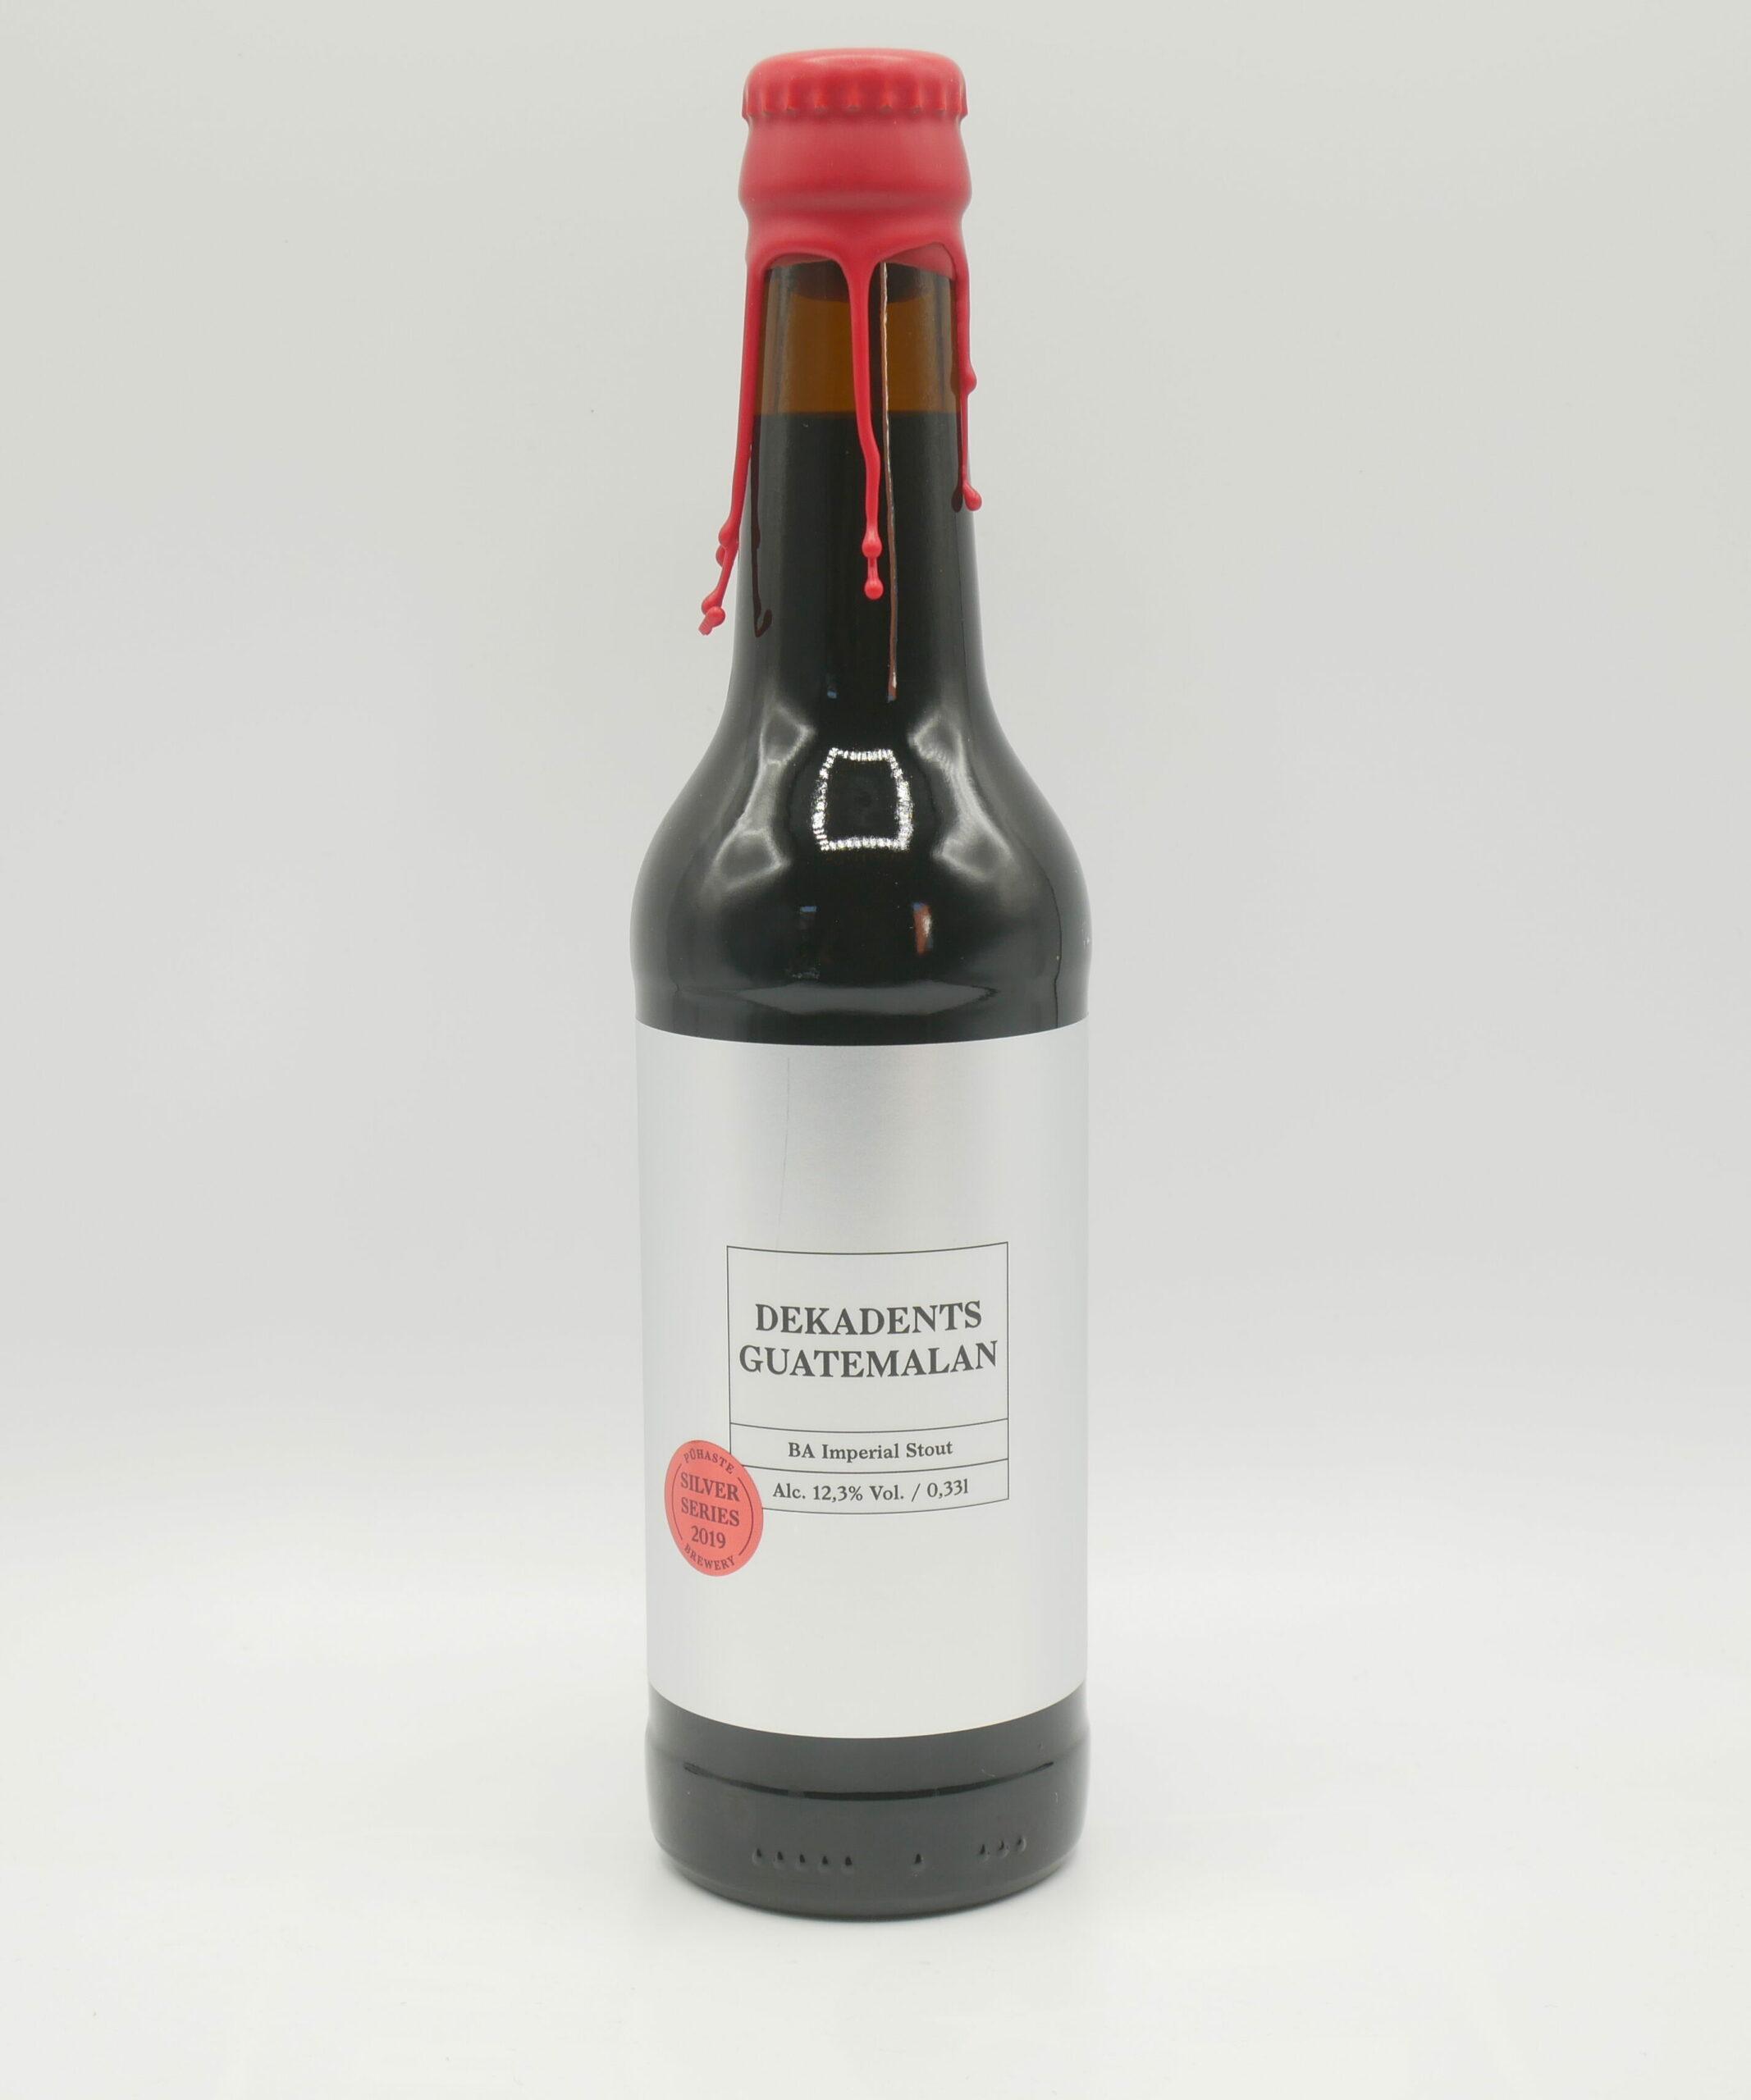 Img Dekadents Guatemalan Rum Ba